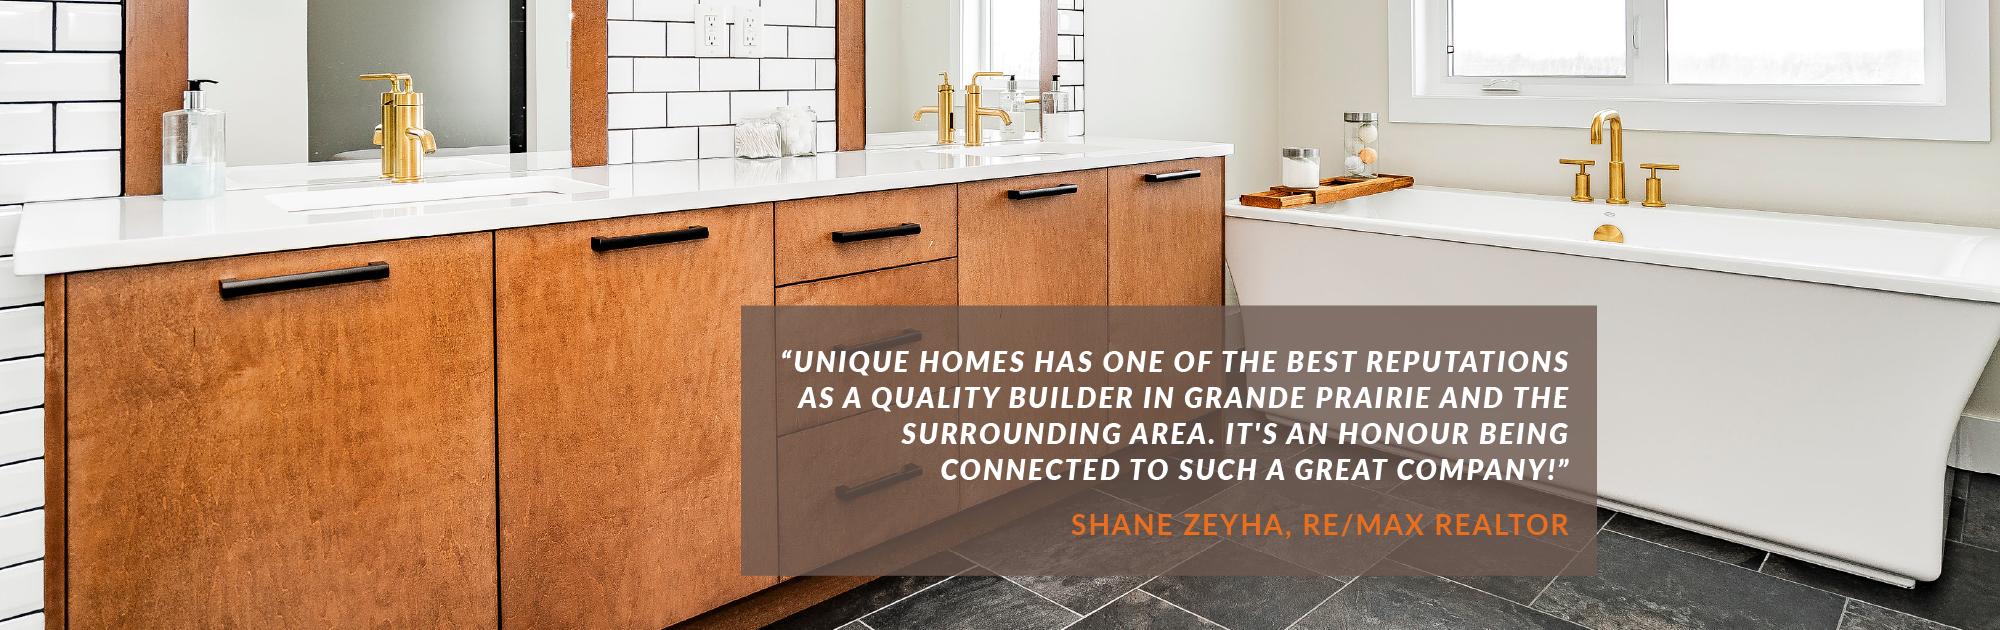 Unique Home Concepts - Residential Builder in Grande Prairie, AB